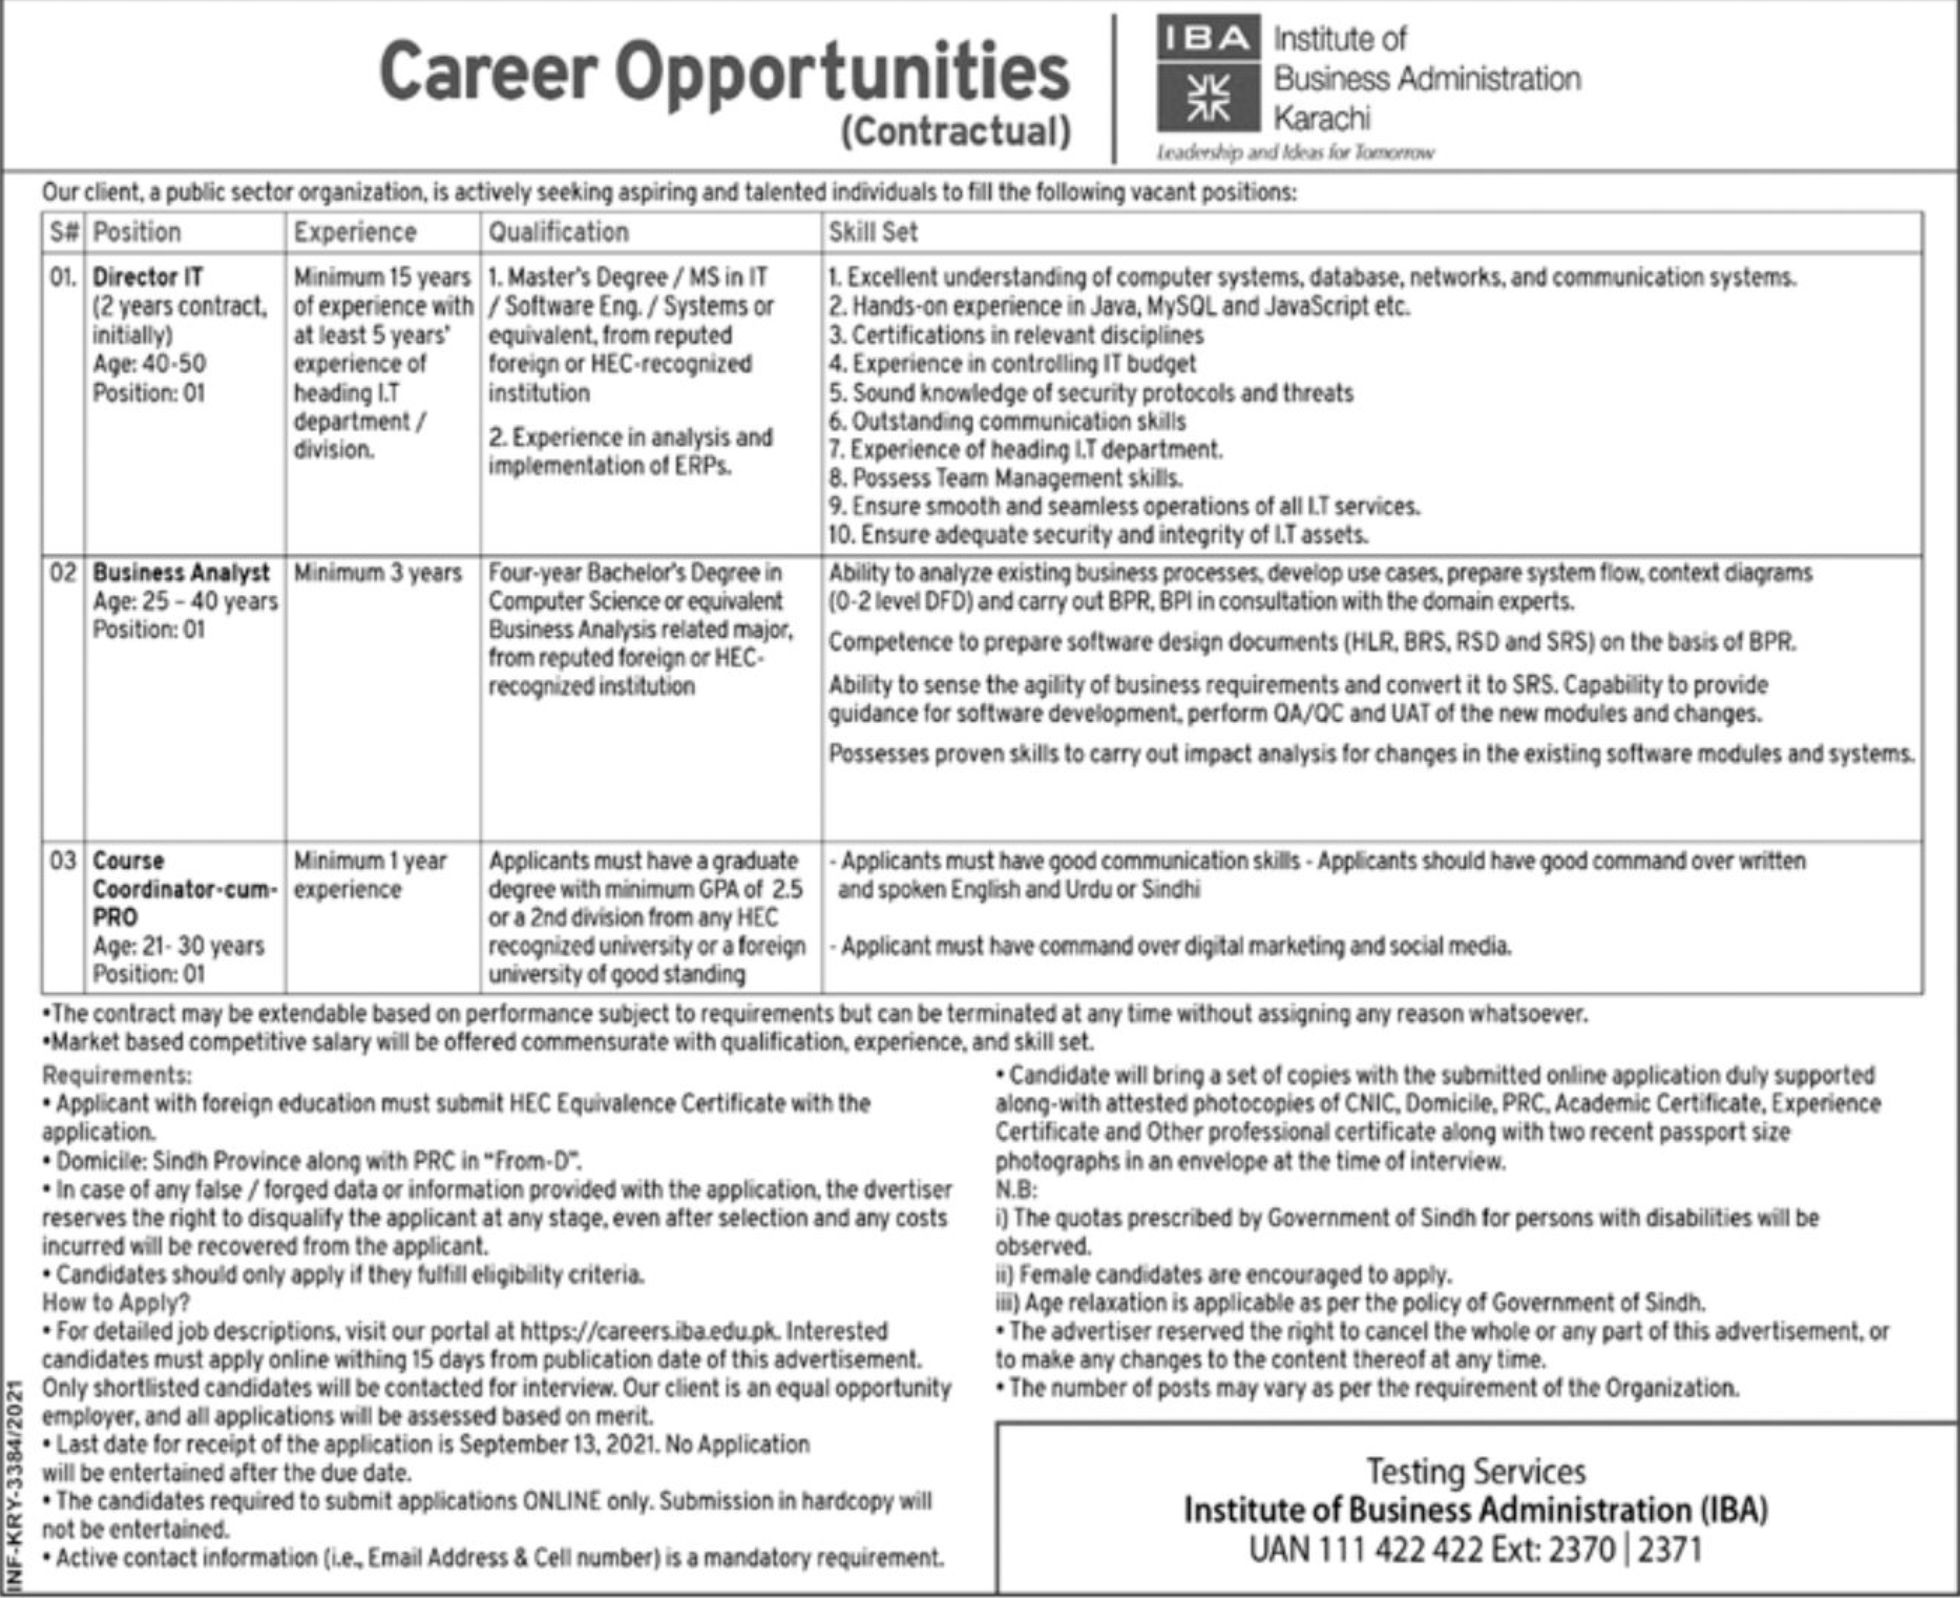 Pubic Sector Organization IBA Karachi Vacancies 2021 3